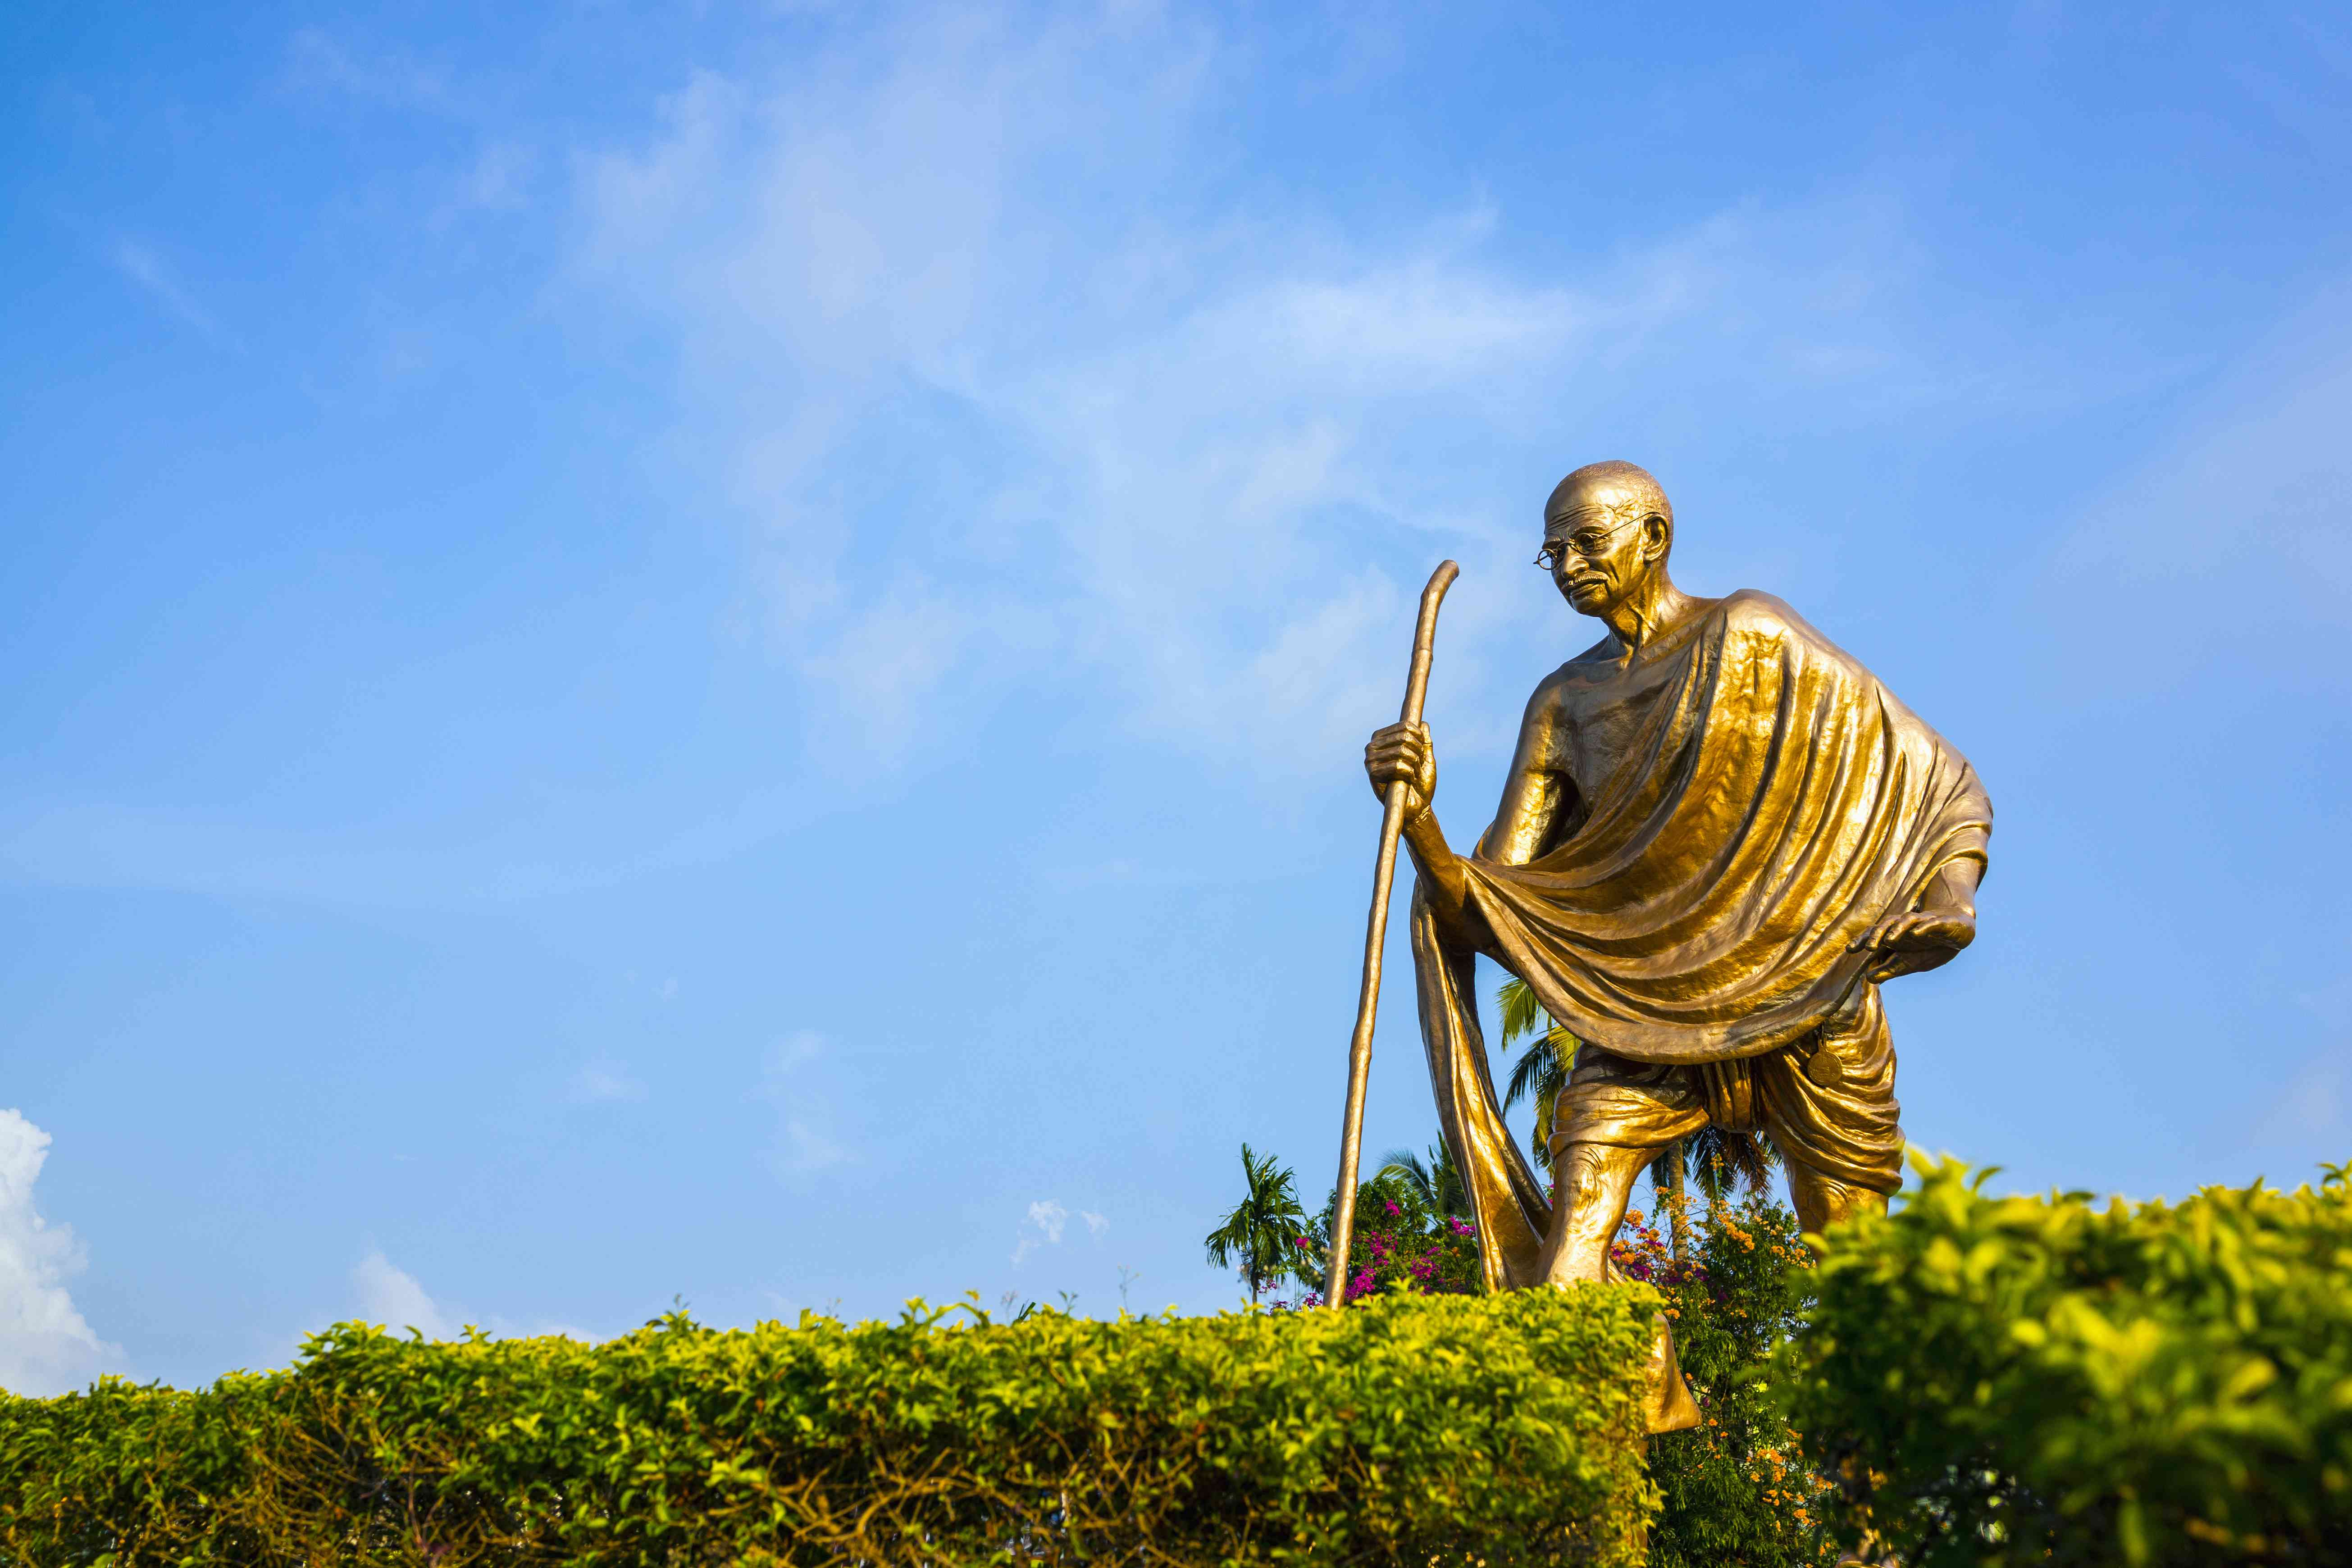 Gandhi statue at Port Blair in the Andaman Islands